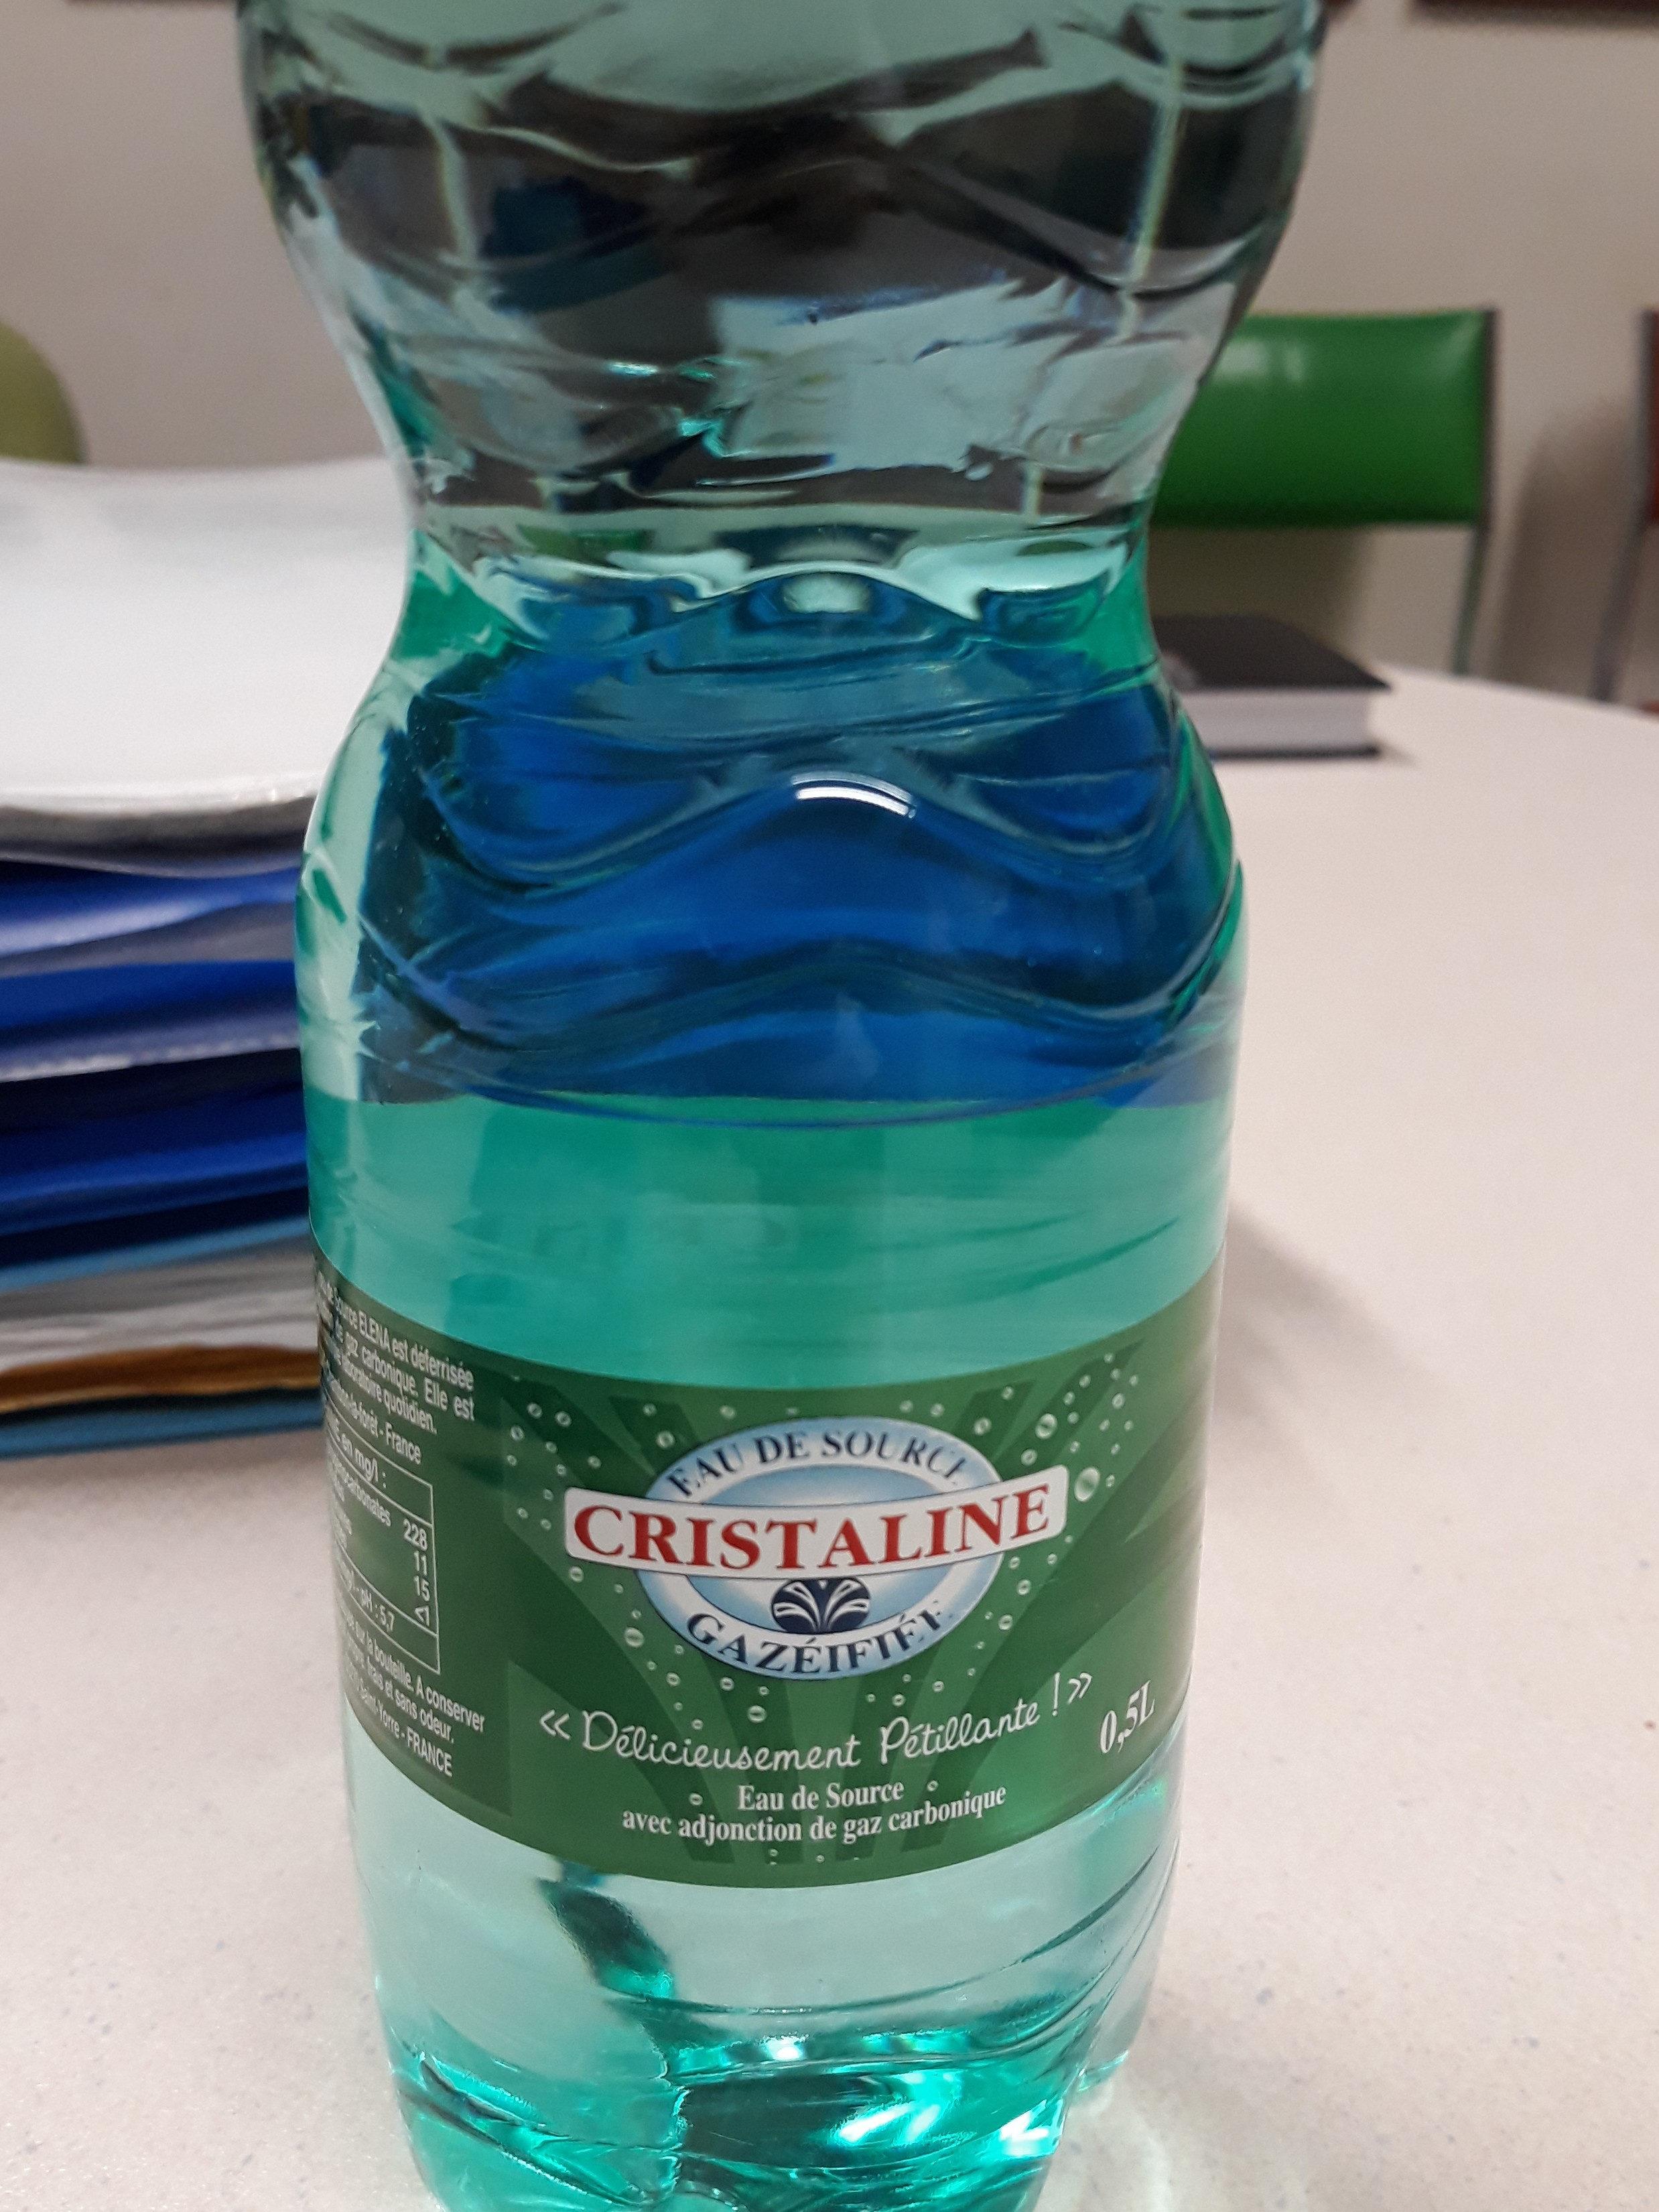 Cristaline pétillante - Product